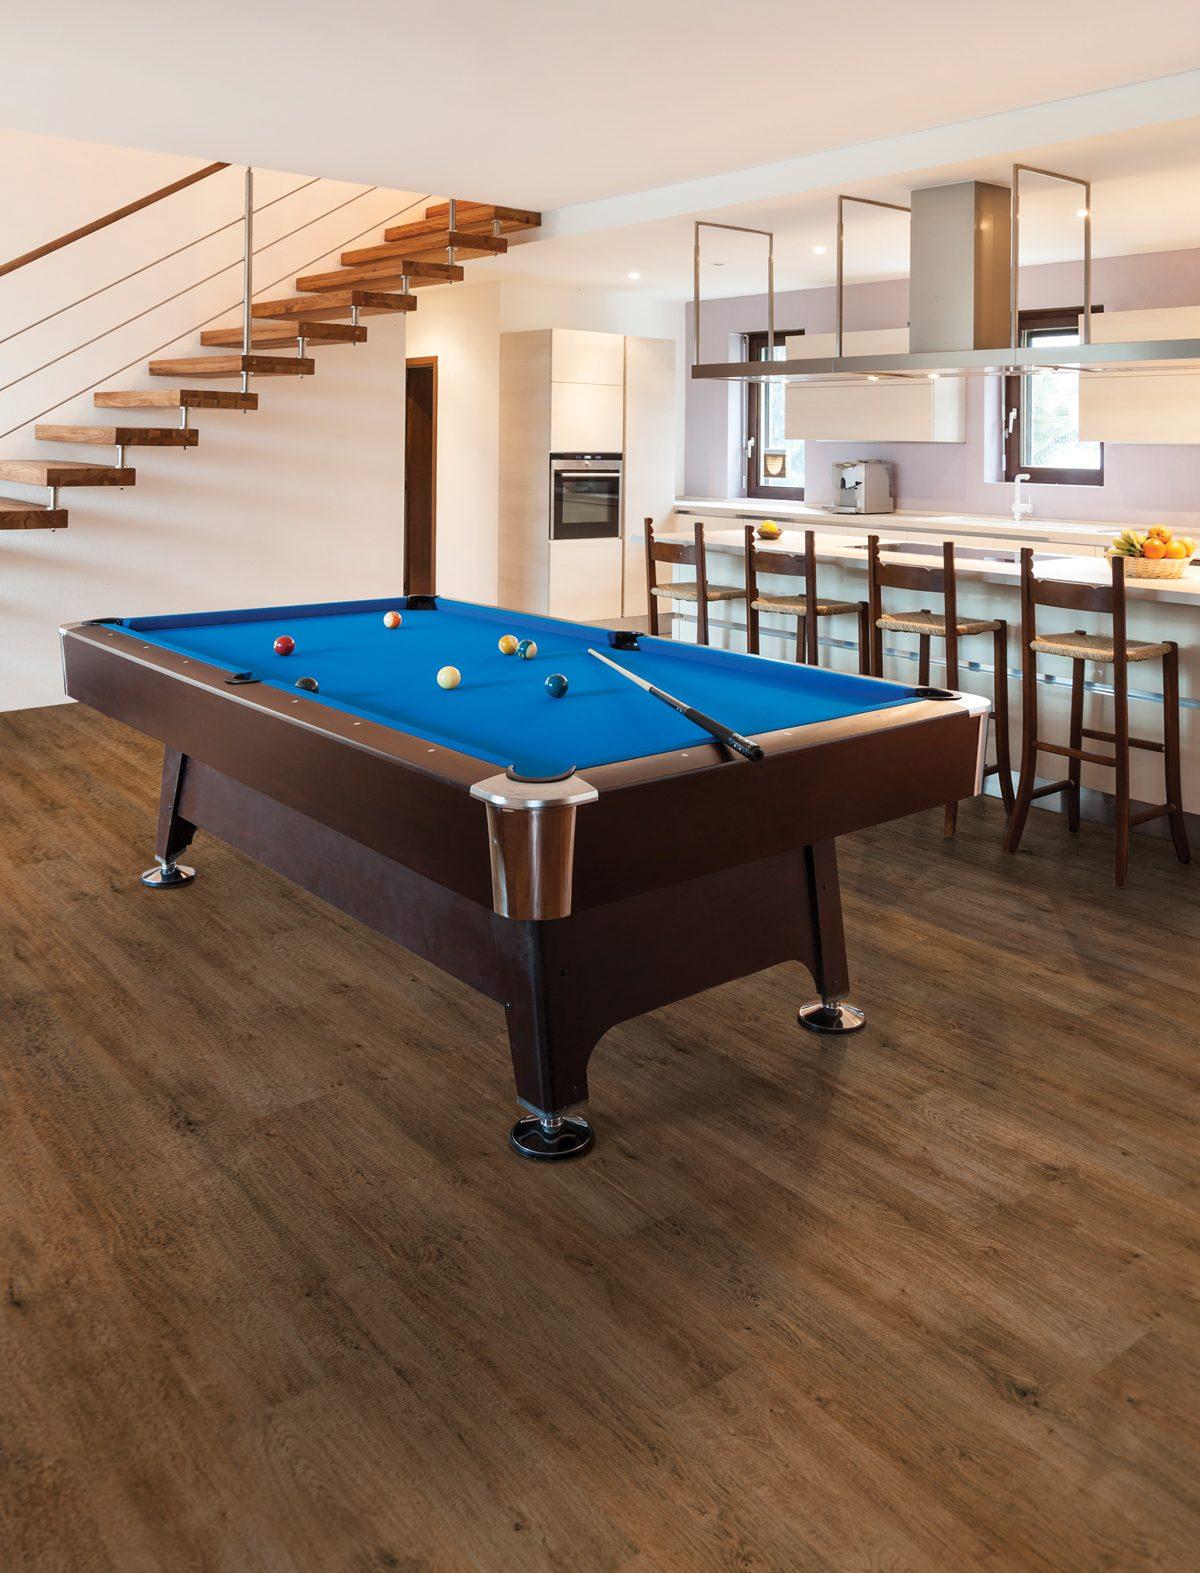 Games Room Flooring Ideas - Choices Flooring